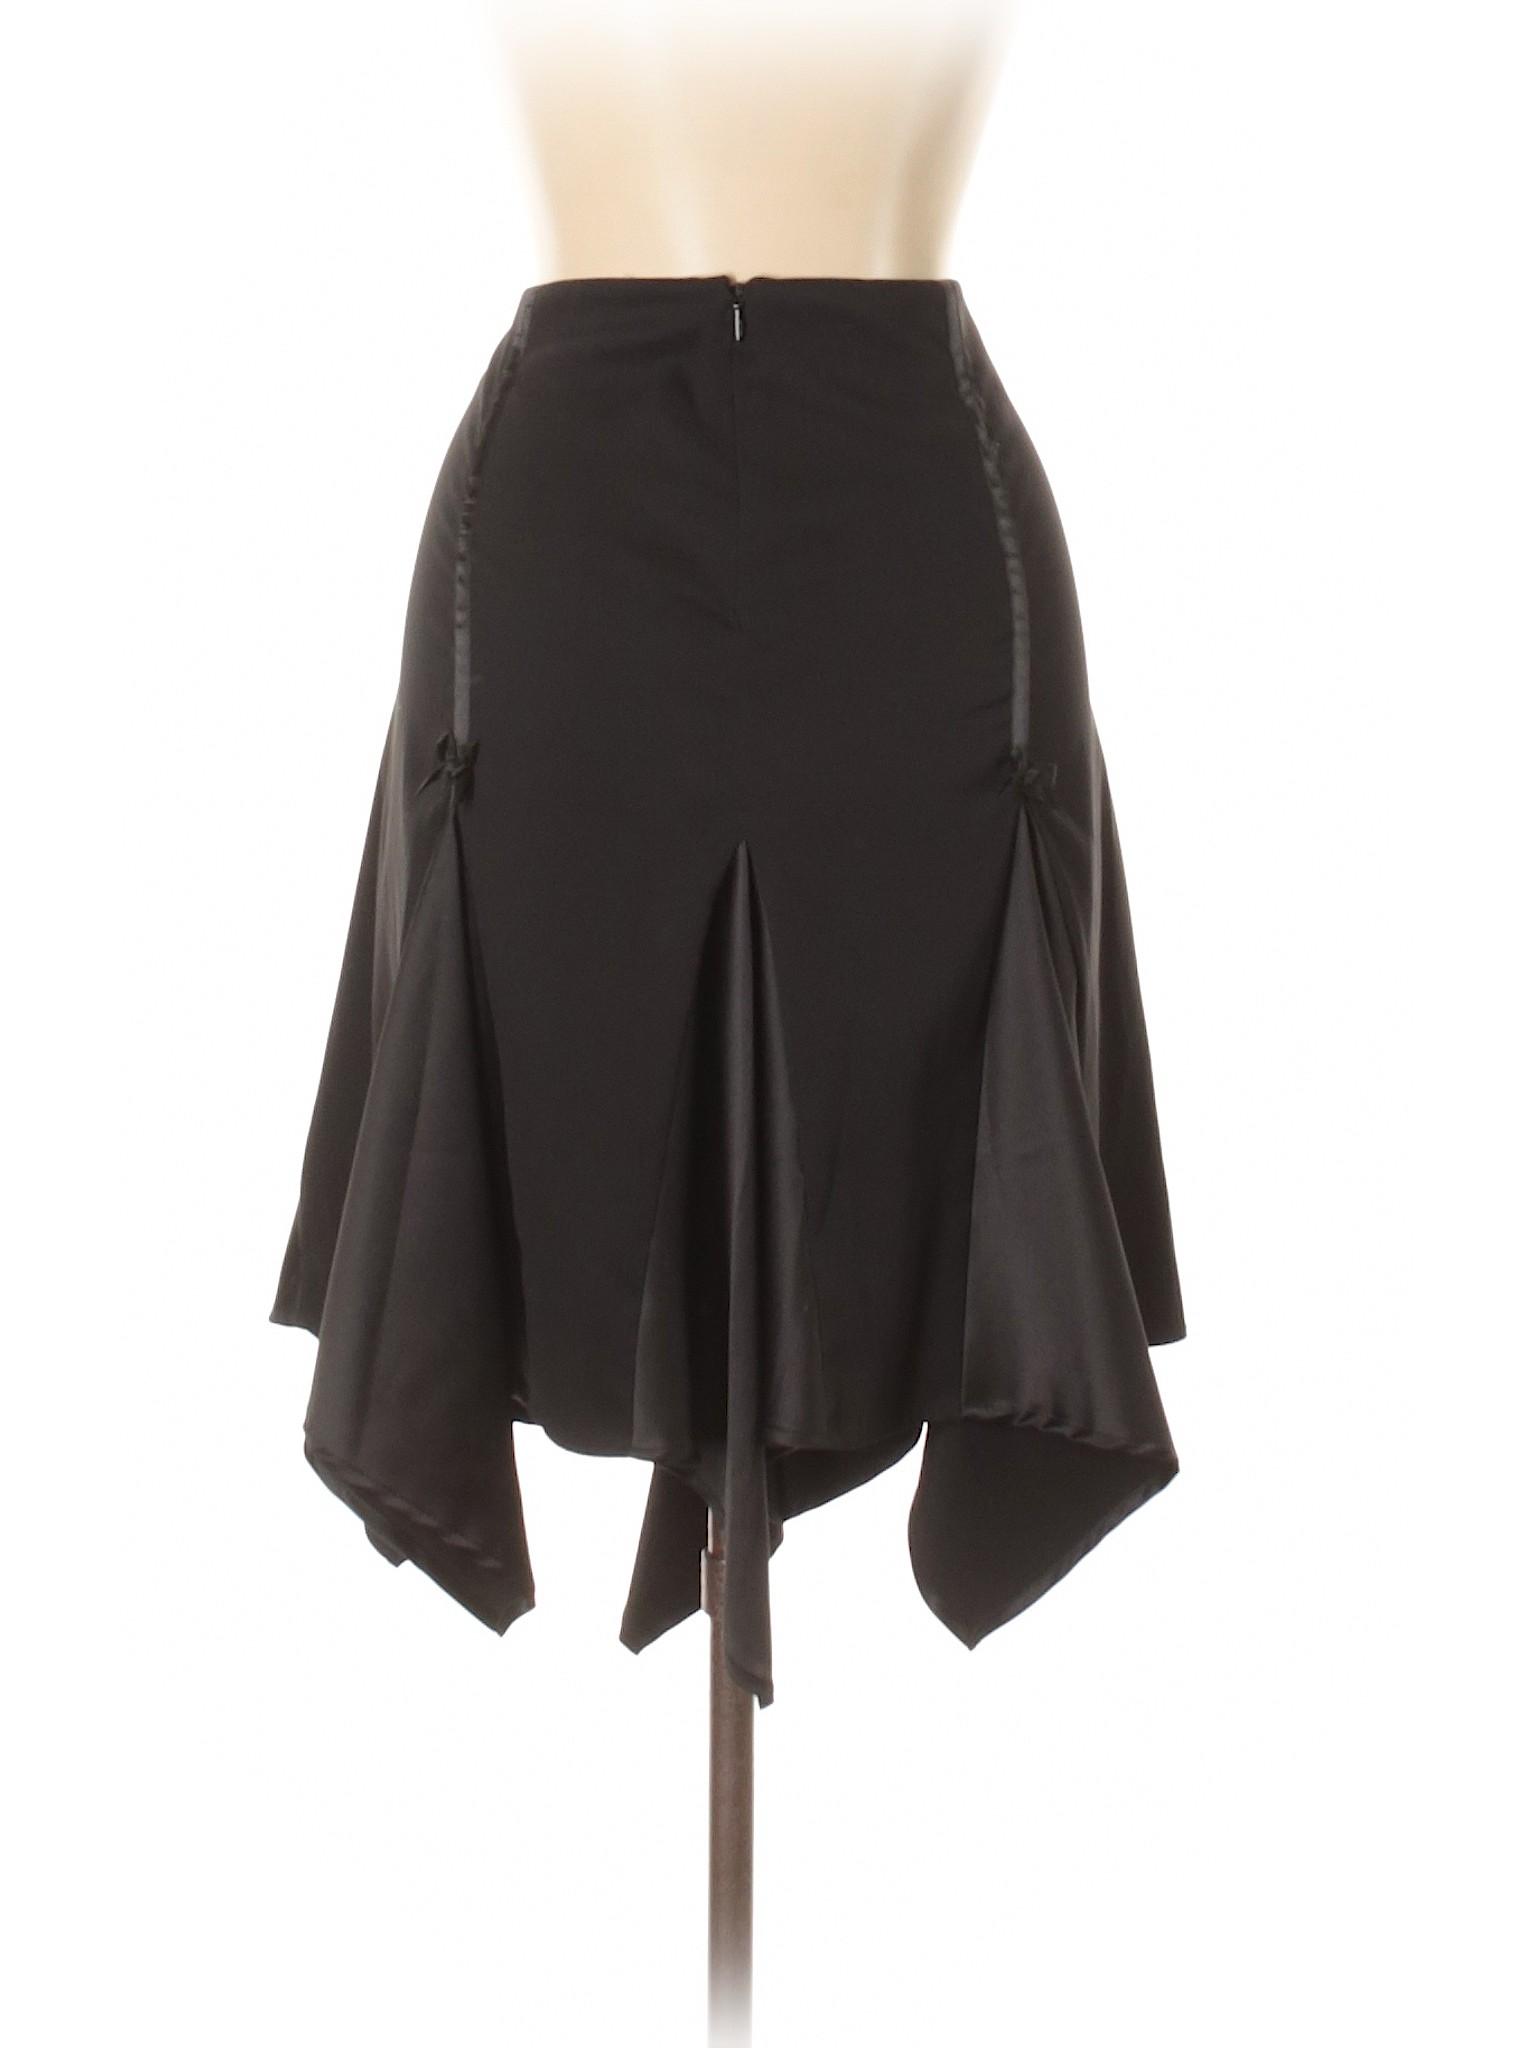 Skirt Boutique Arden Boutique Arden Casual B 1SR0xTq